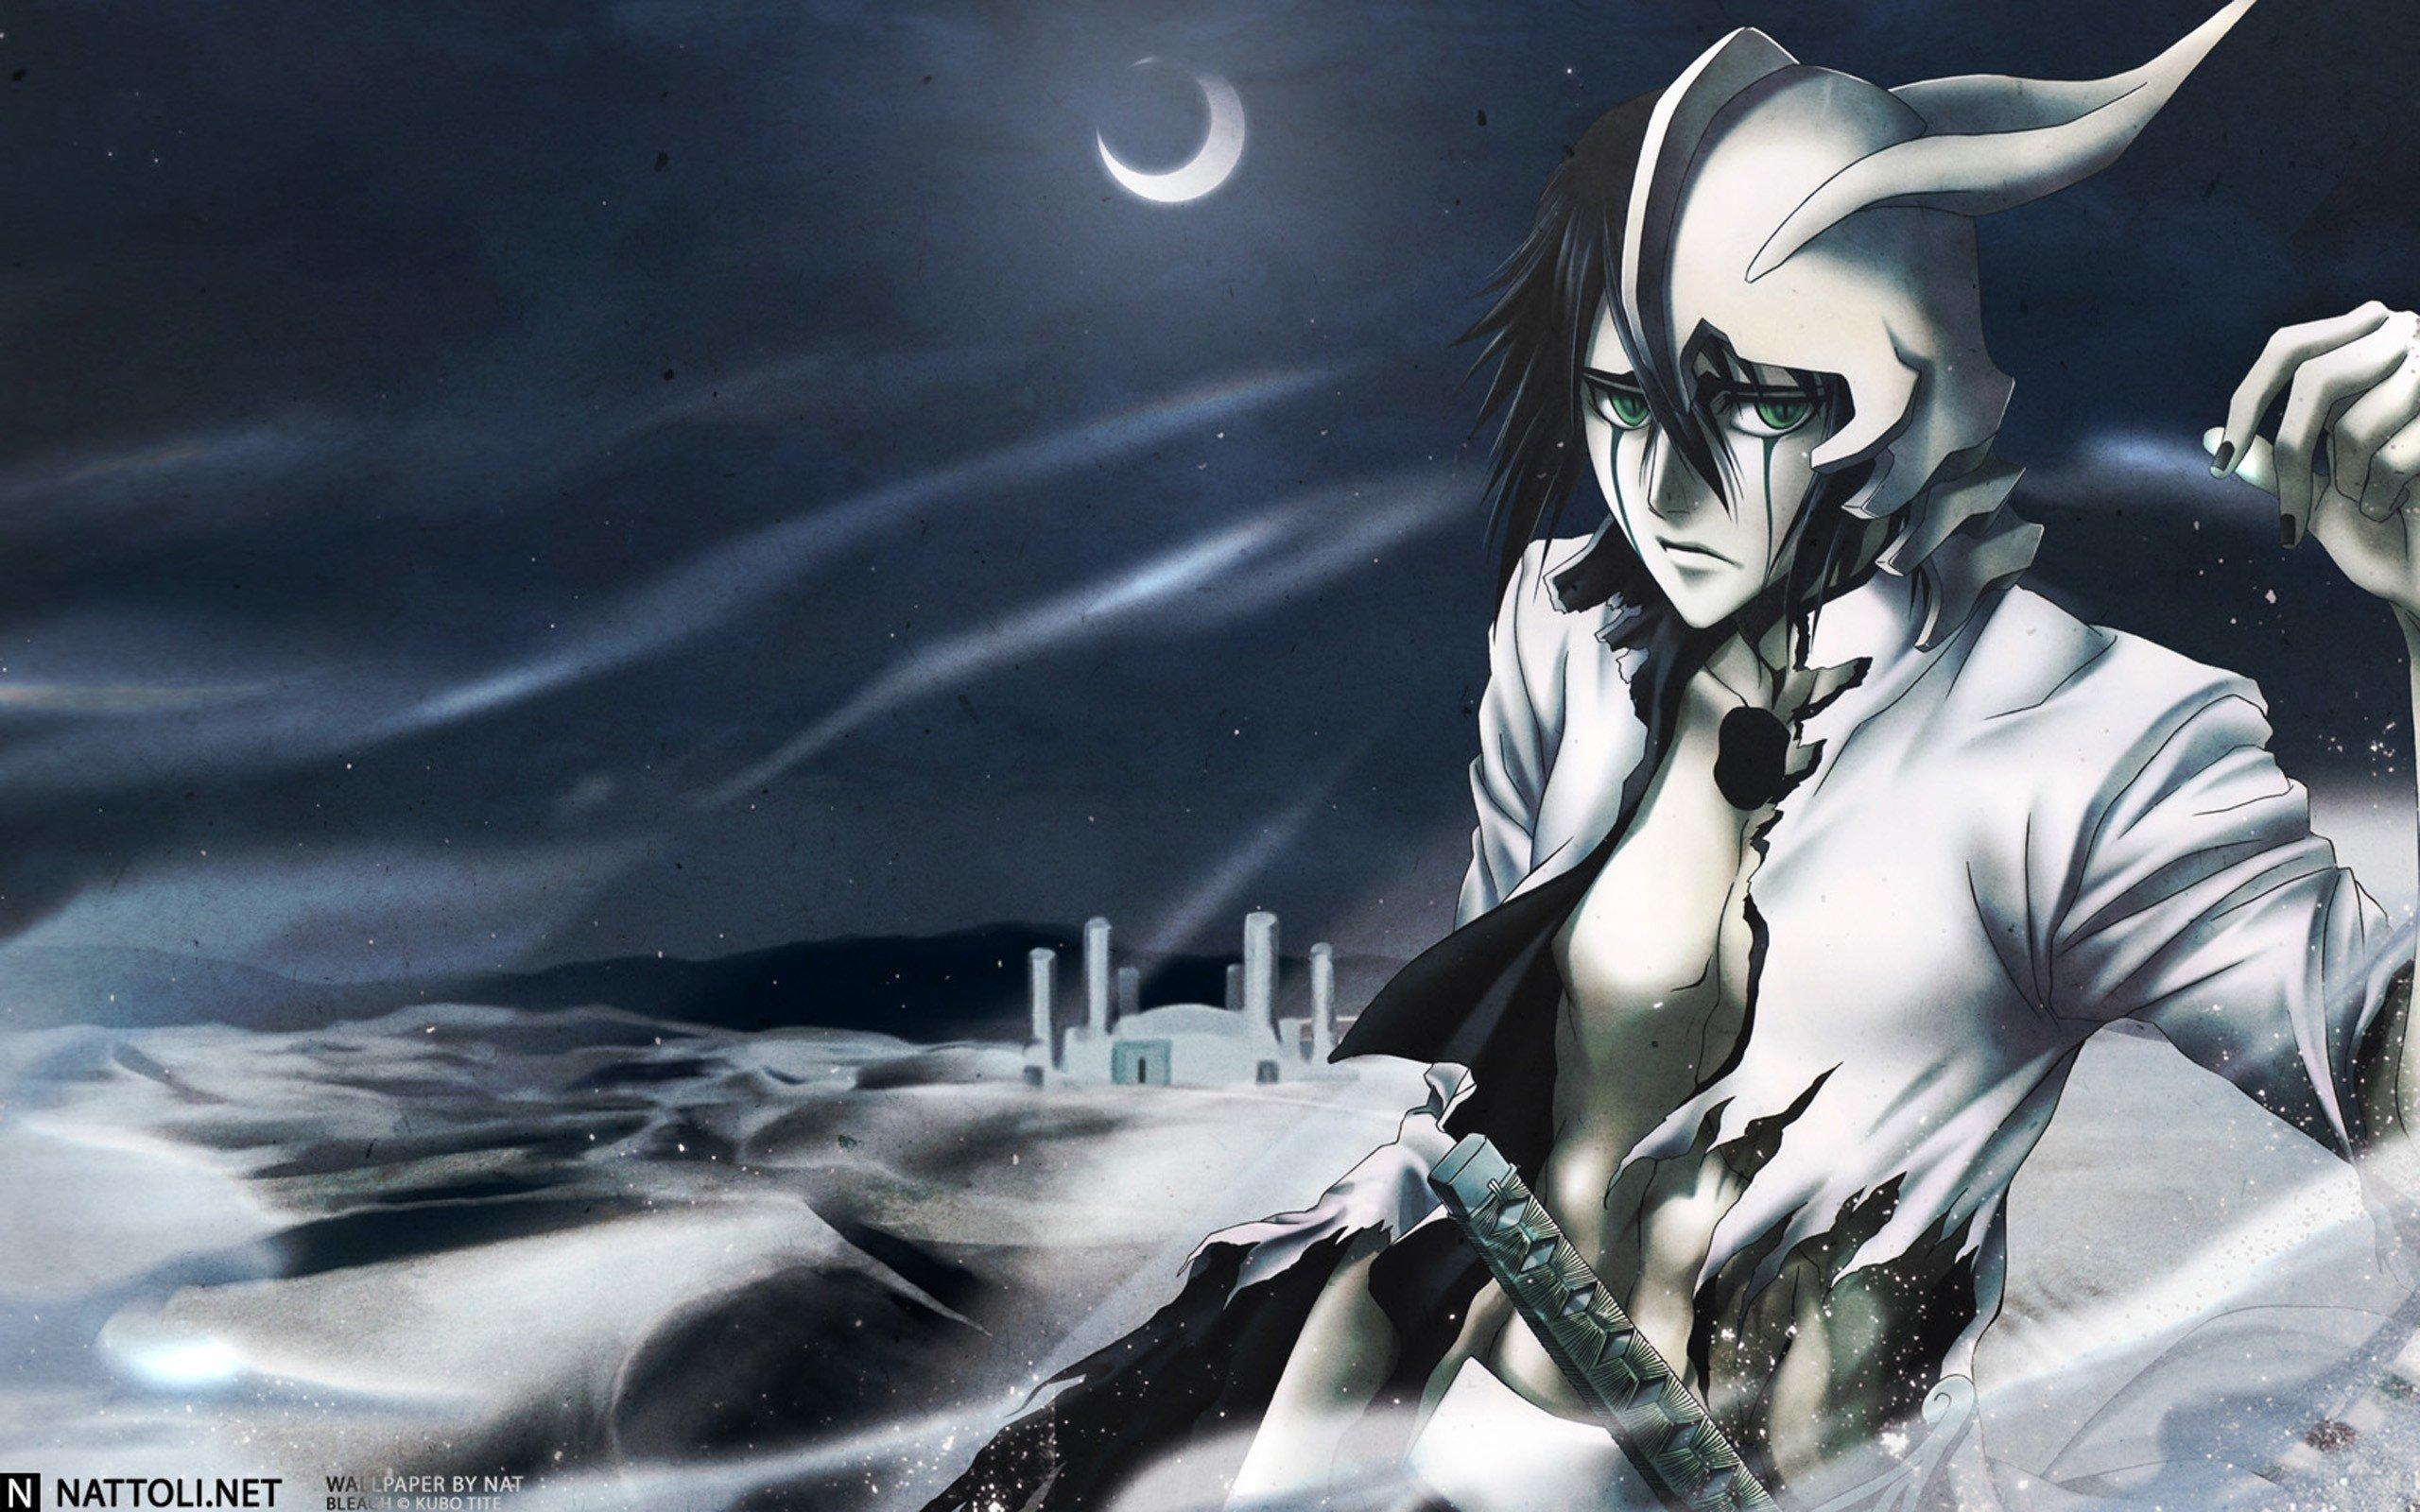 Anime Bleach Ulquiorra Cifer Espada HD Wallpapers Desktop And Mobile Images Photos